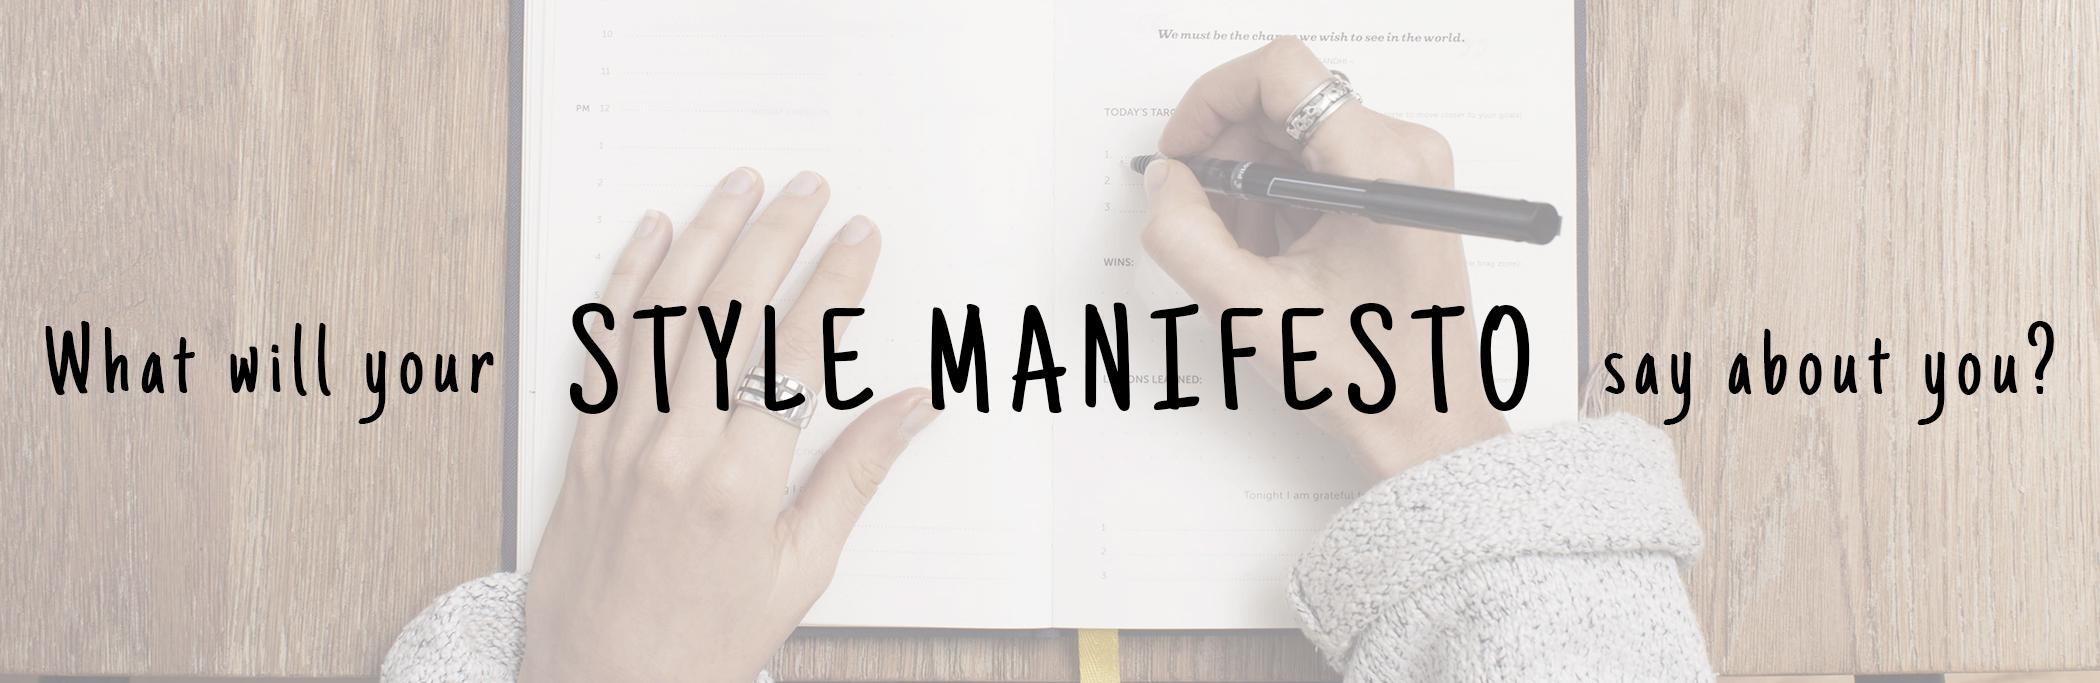 ManifestoGraphic.jpg